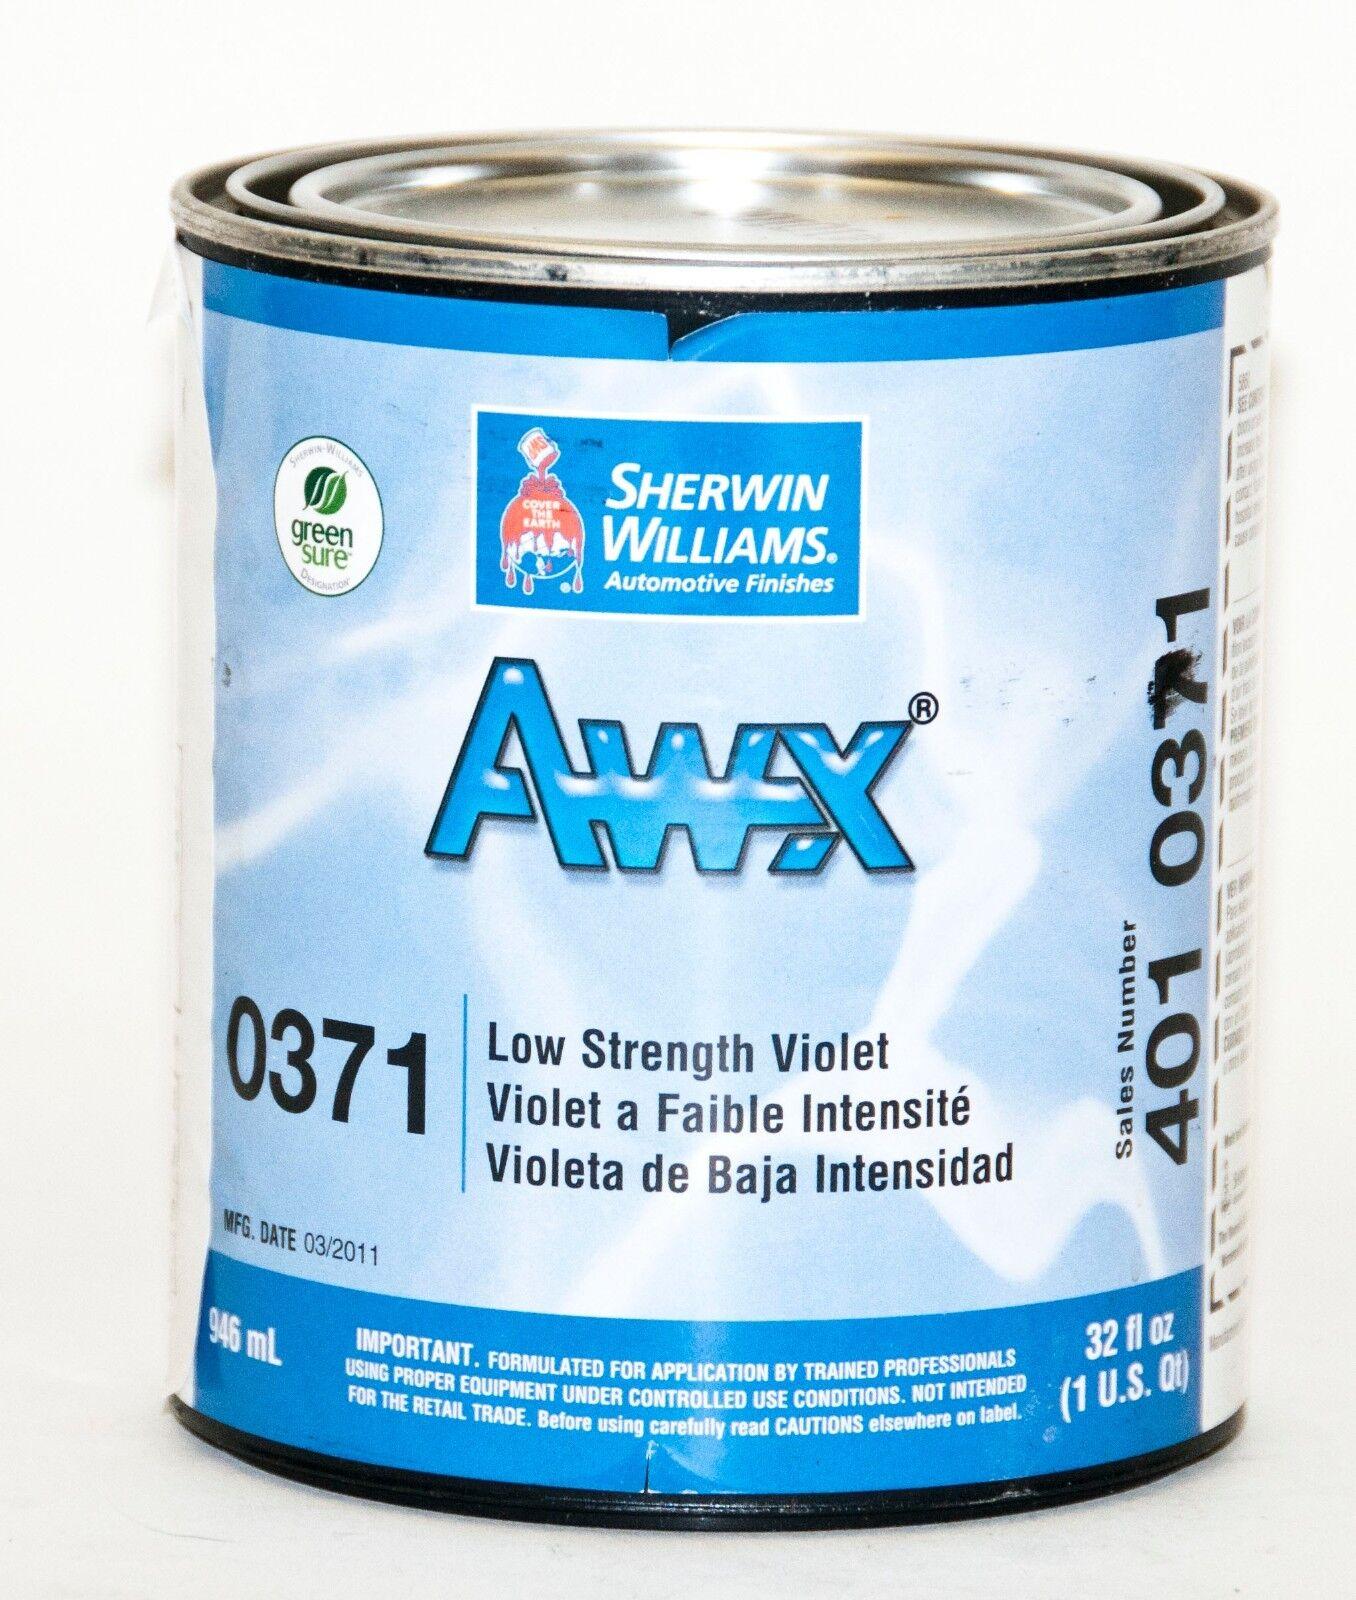 Sherwin Williams Awx Performance Plus Basecoat, Quart 32